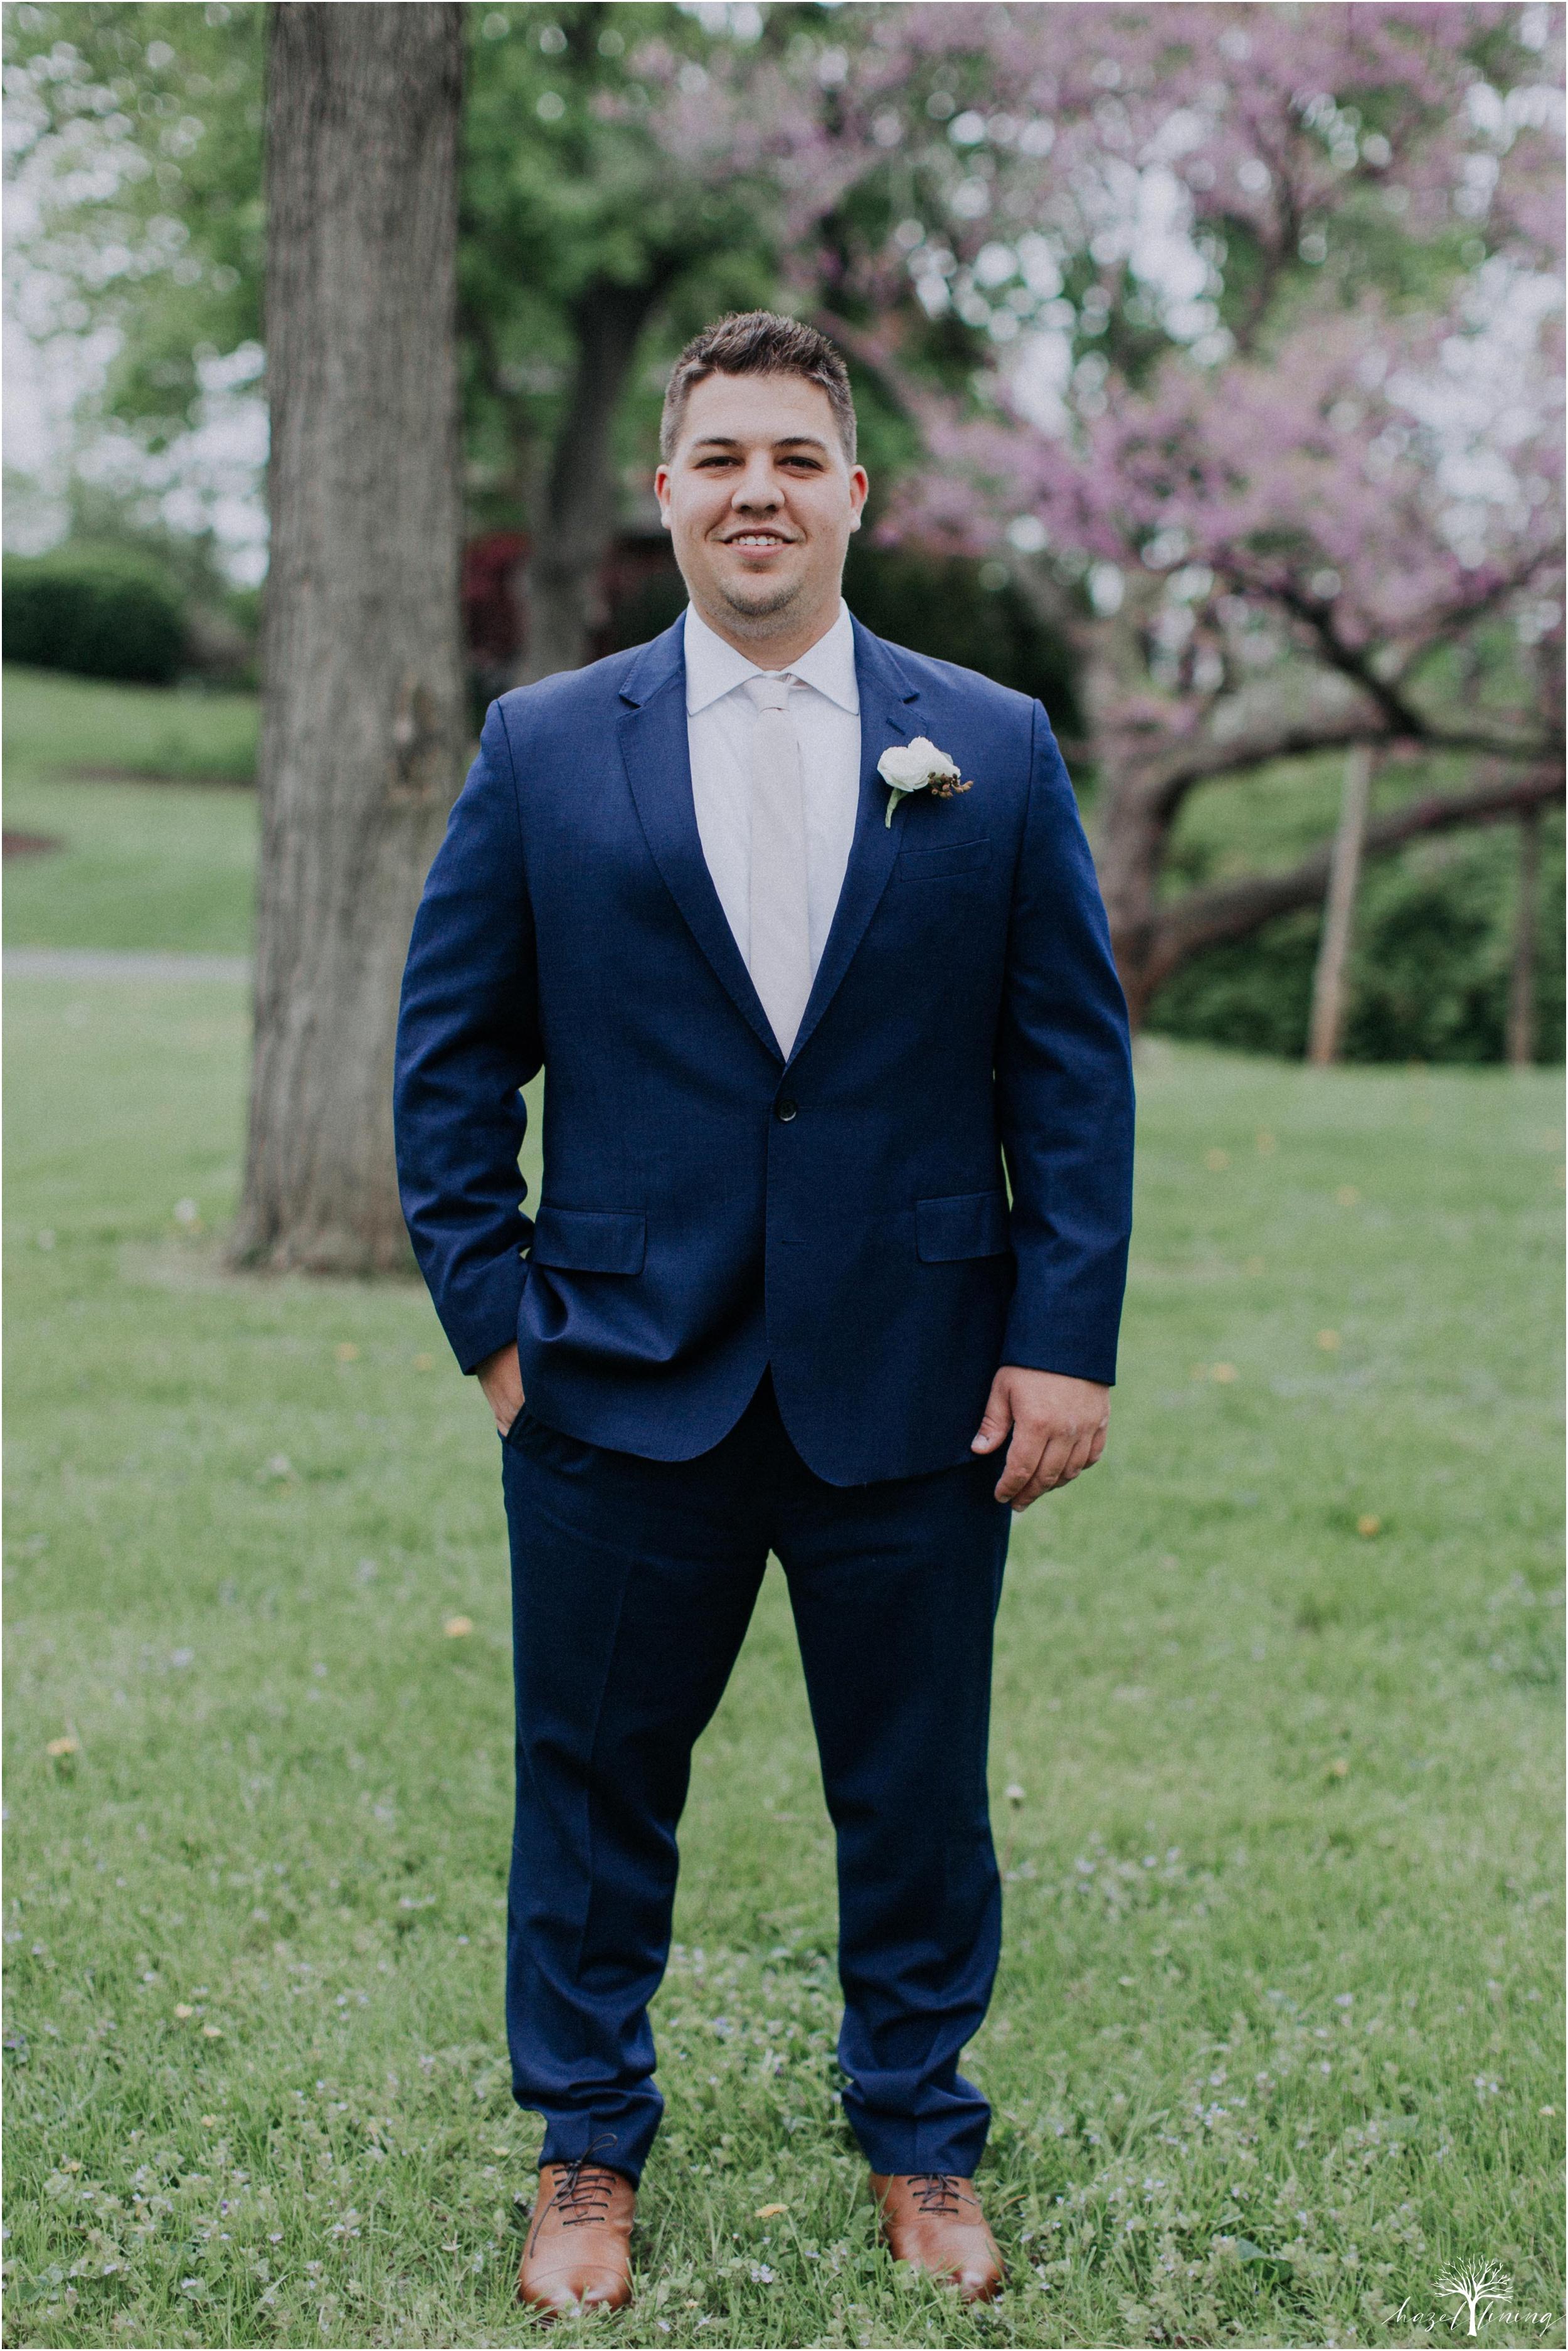 hazel-lining-travel-wedding-elopement-photography-abby-skyler-hunt-the-willis-house-york-pennsylvania-outdoor-estate-wedding_0018.jpg